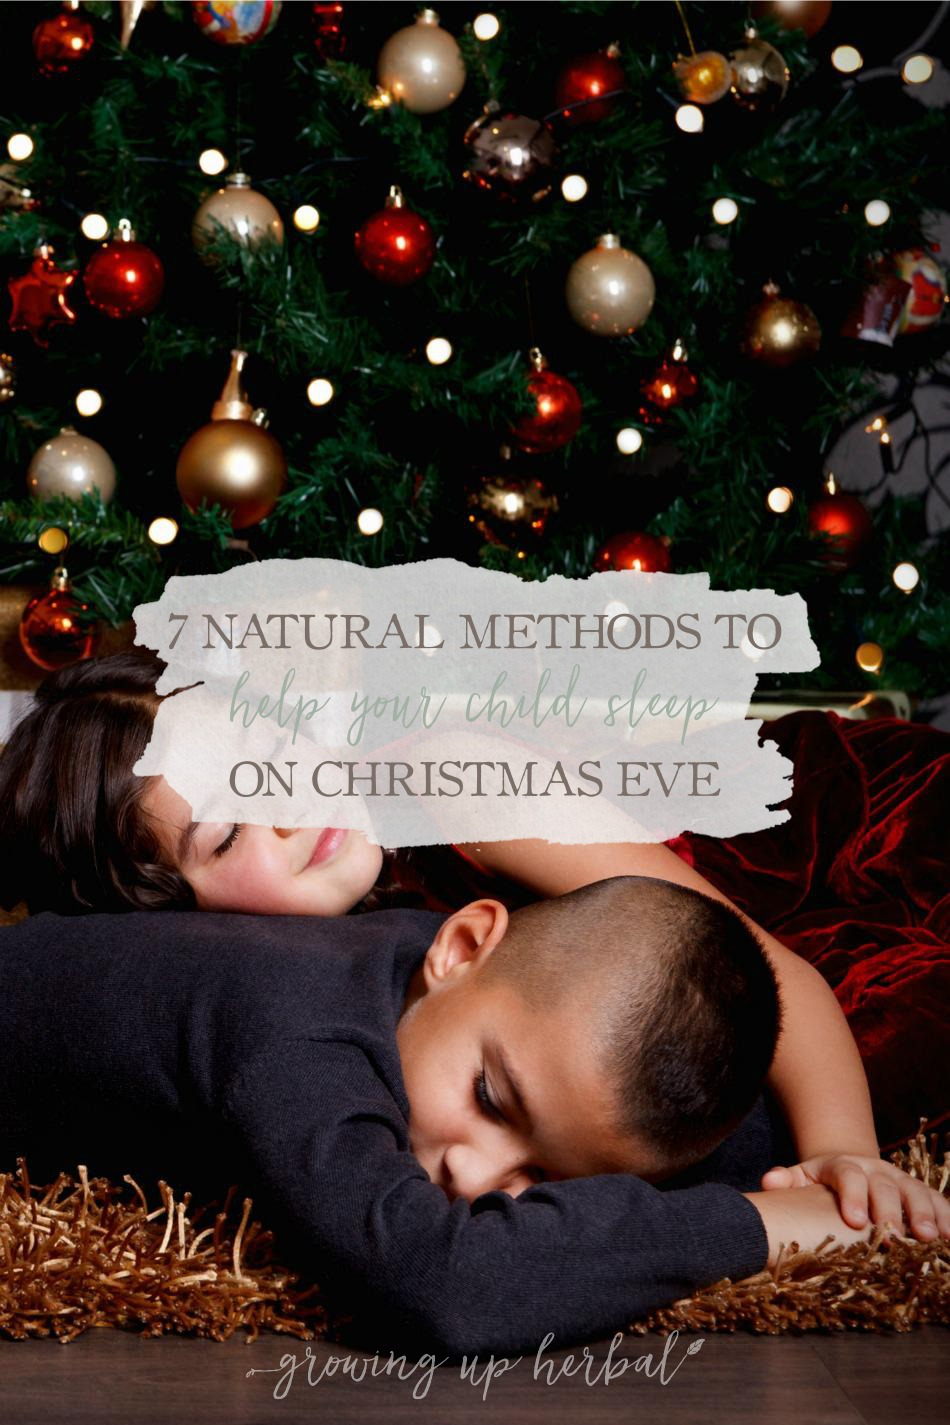 7 natural methods to help your child sleep on christmas eve growing up herbal - How To Go To Sleep On Christmas Eve